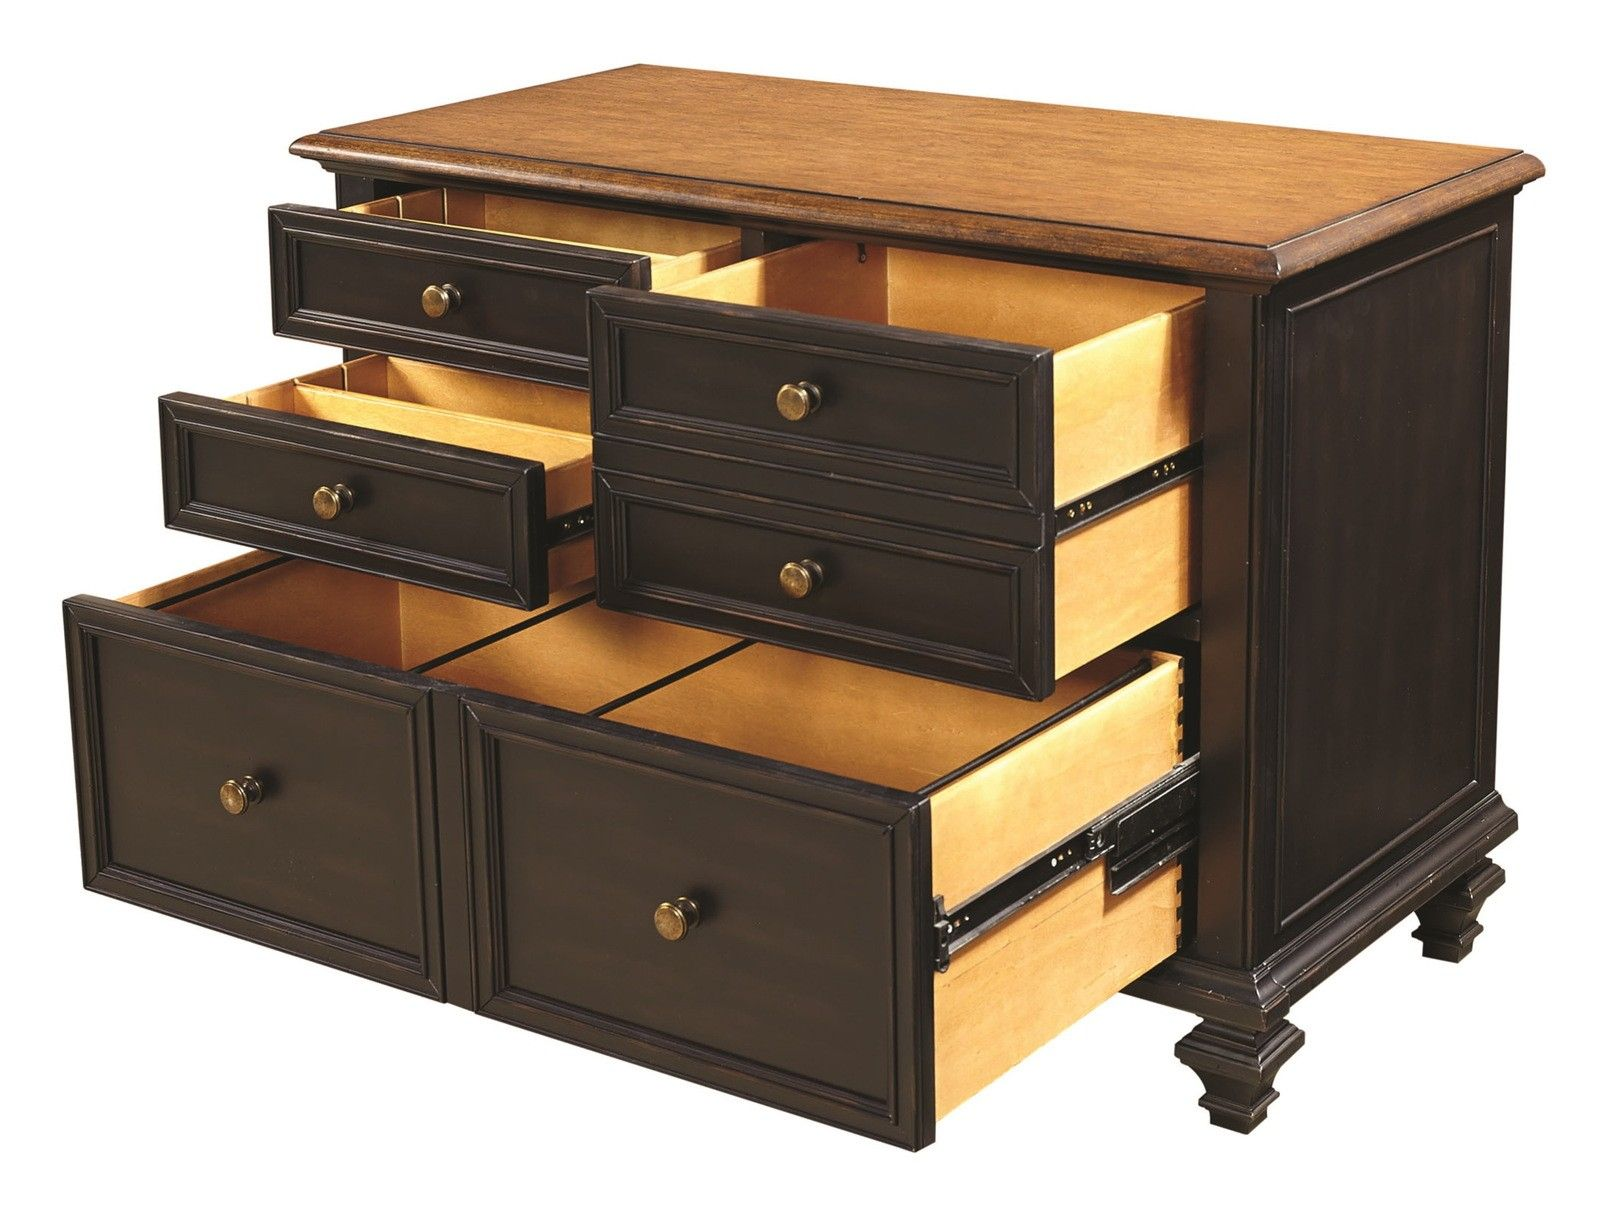 Aspenhome ravenwood drawer combo file in antique black i